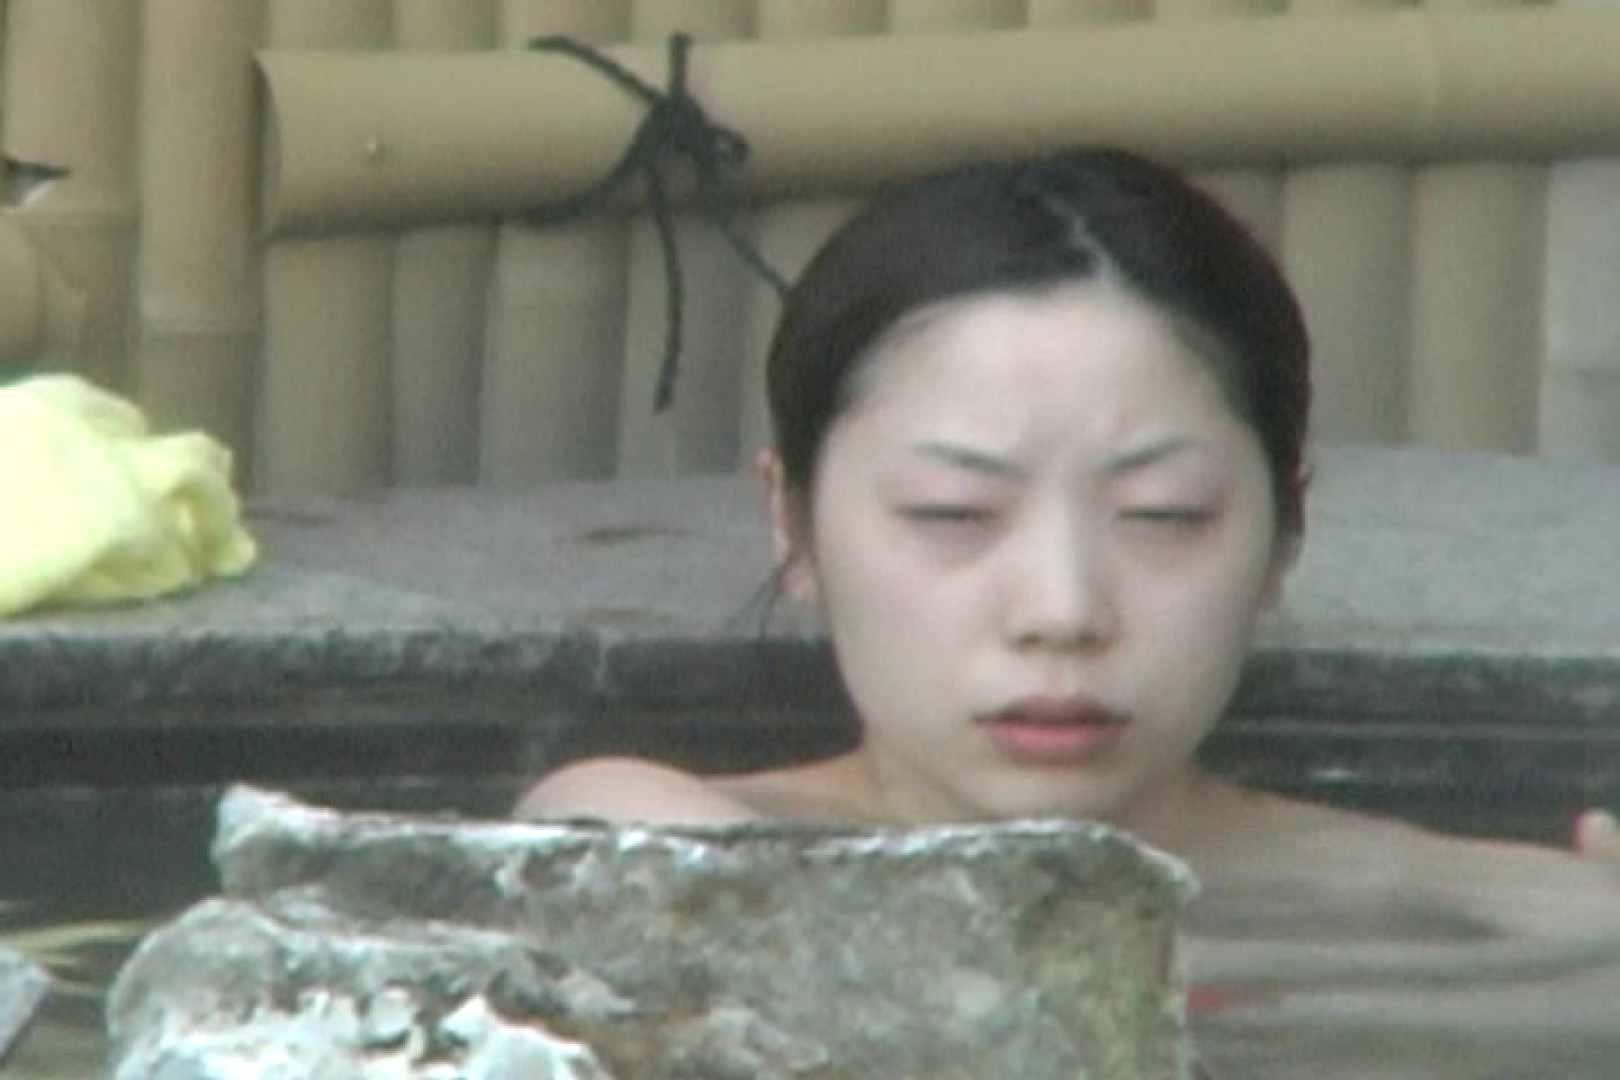 Aquaな露天風呂Vol.596 OLセックス | 盗撮  77画像 28